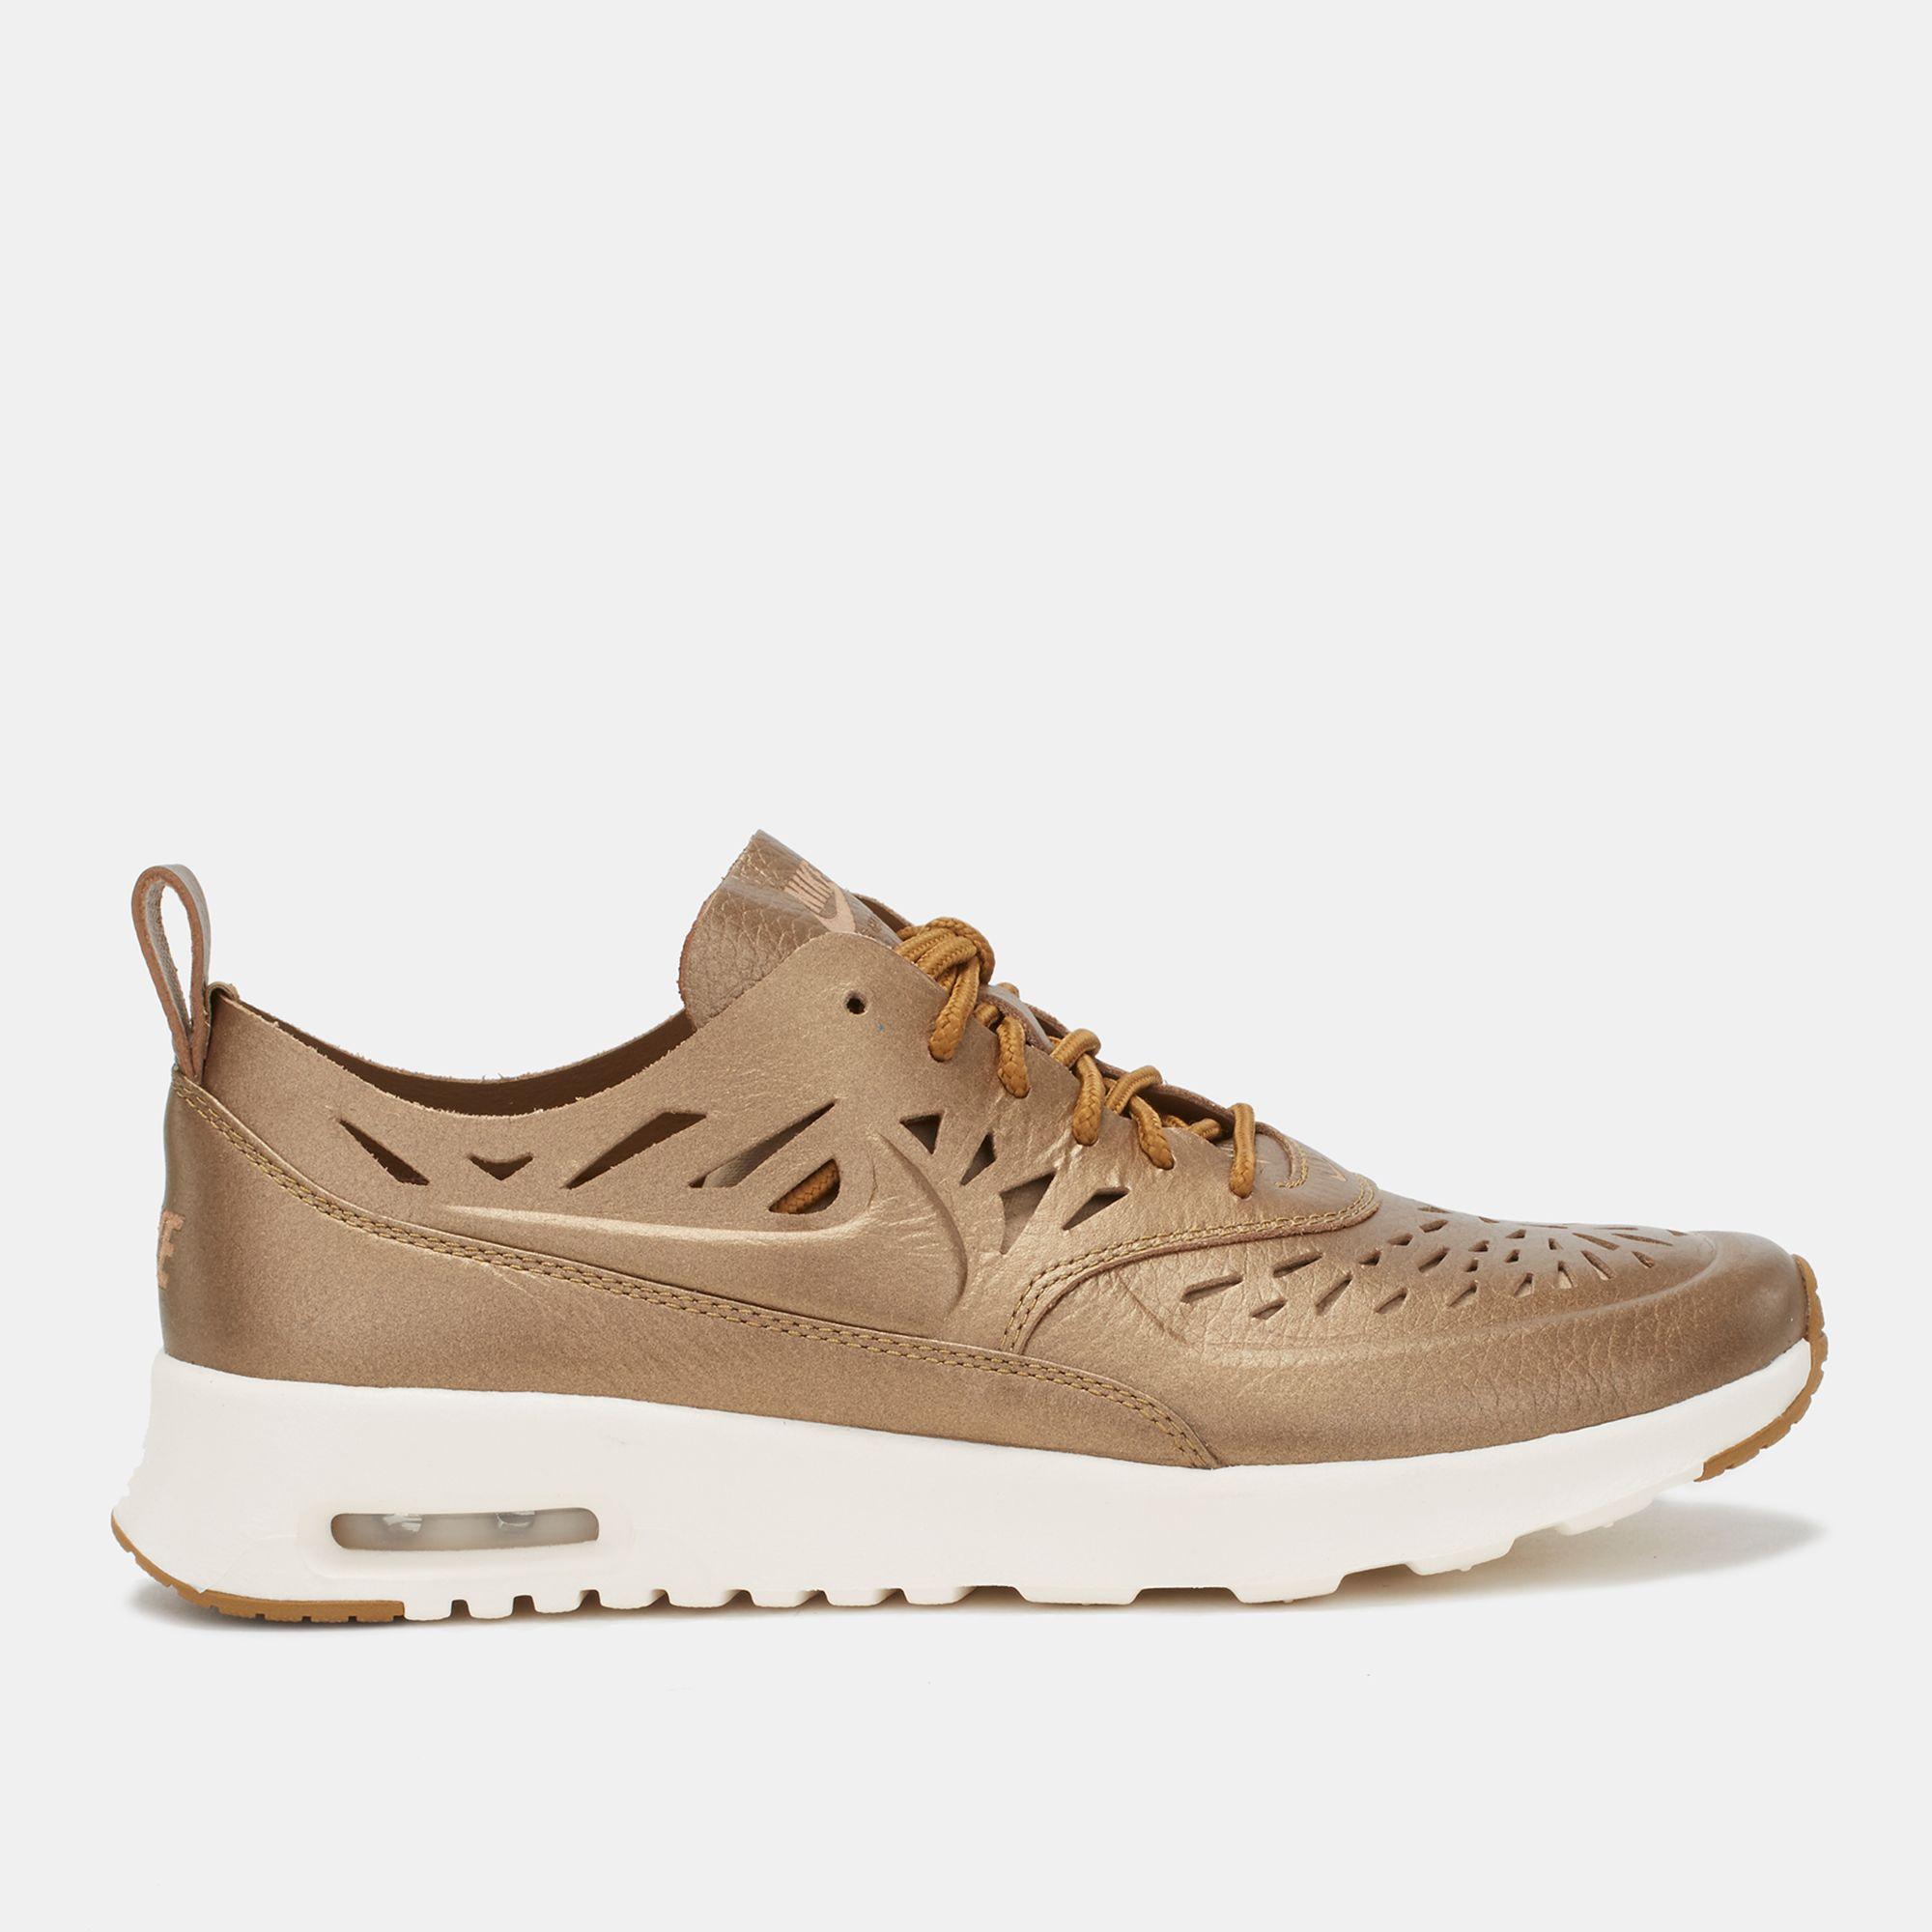 huge discount 2bb09 c6aa1 Shop Gold Nike Air Max Thea Joli Shoe for Womens by Nike   SSS